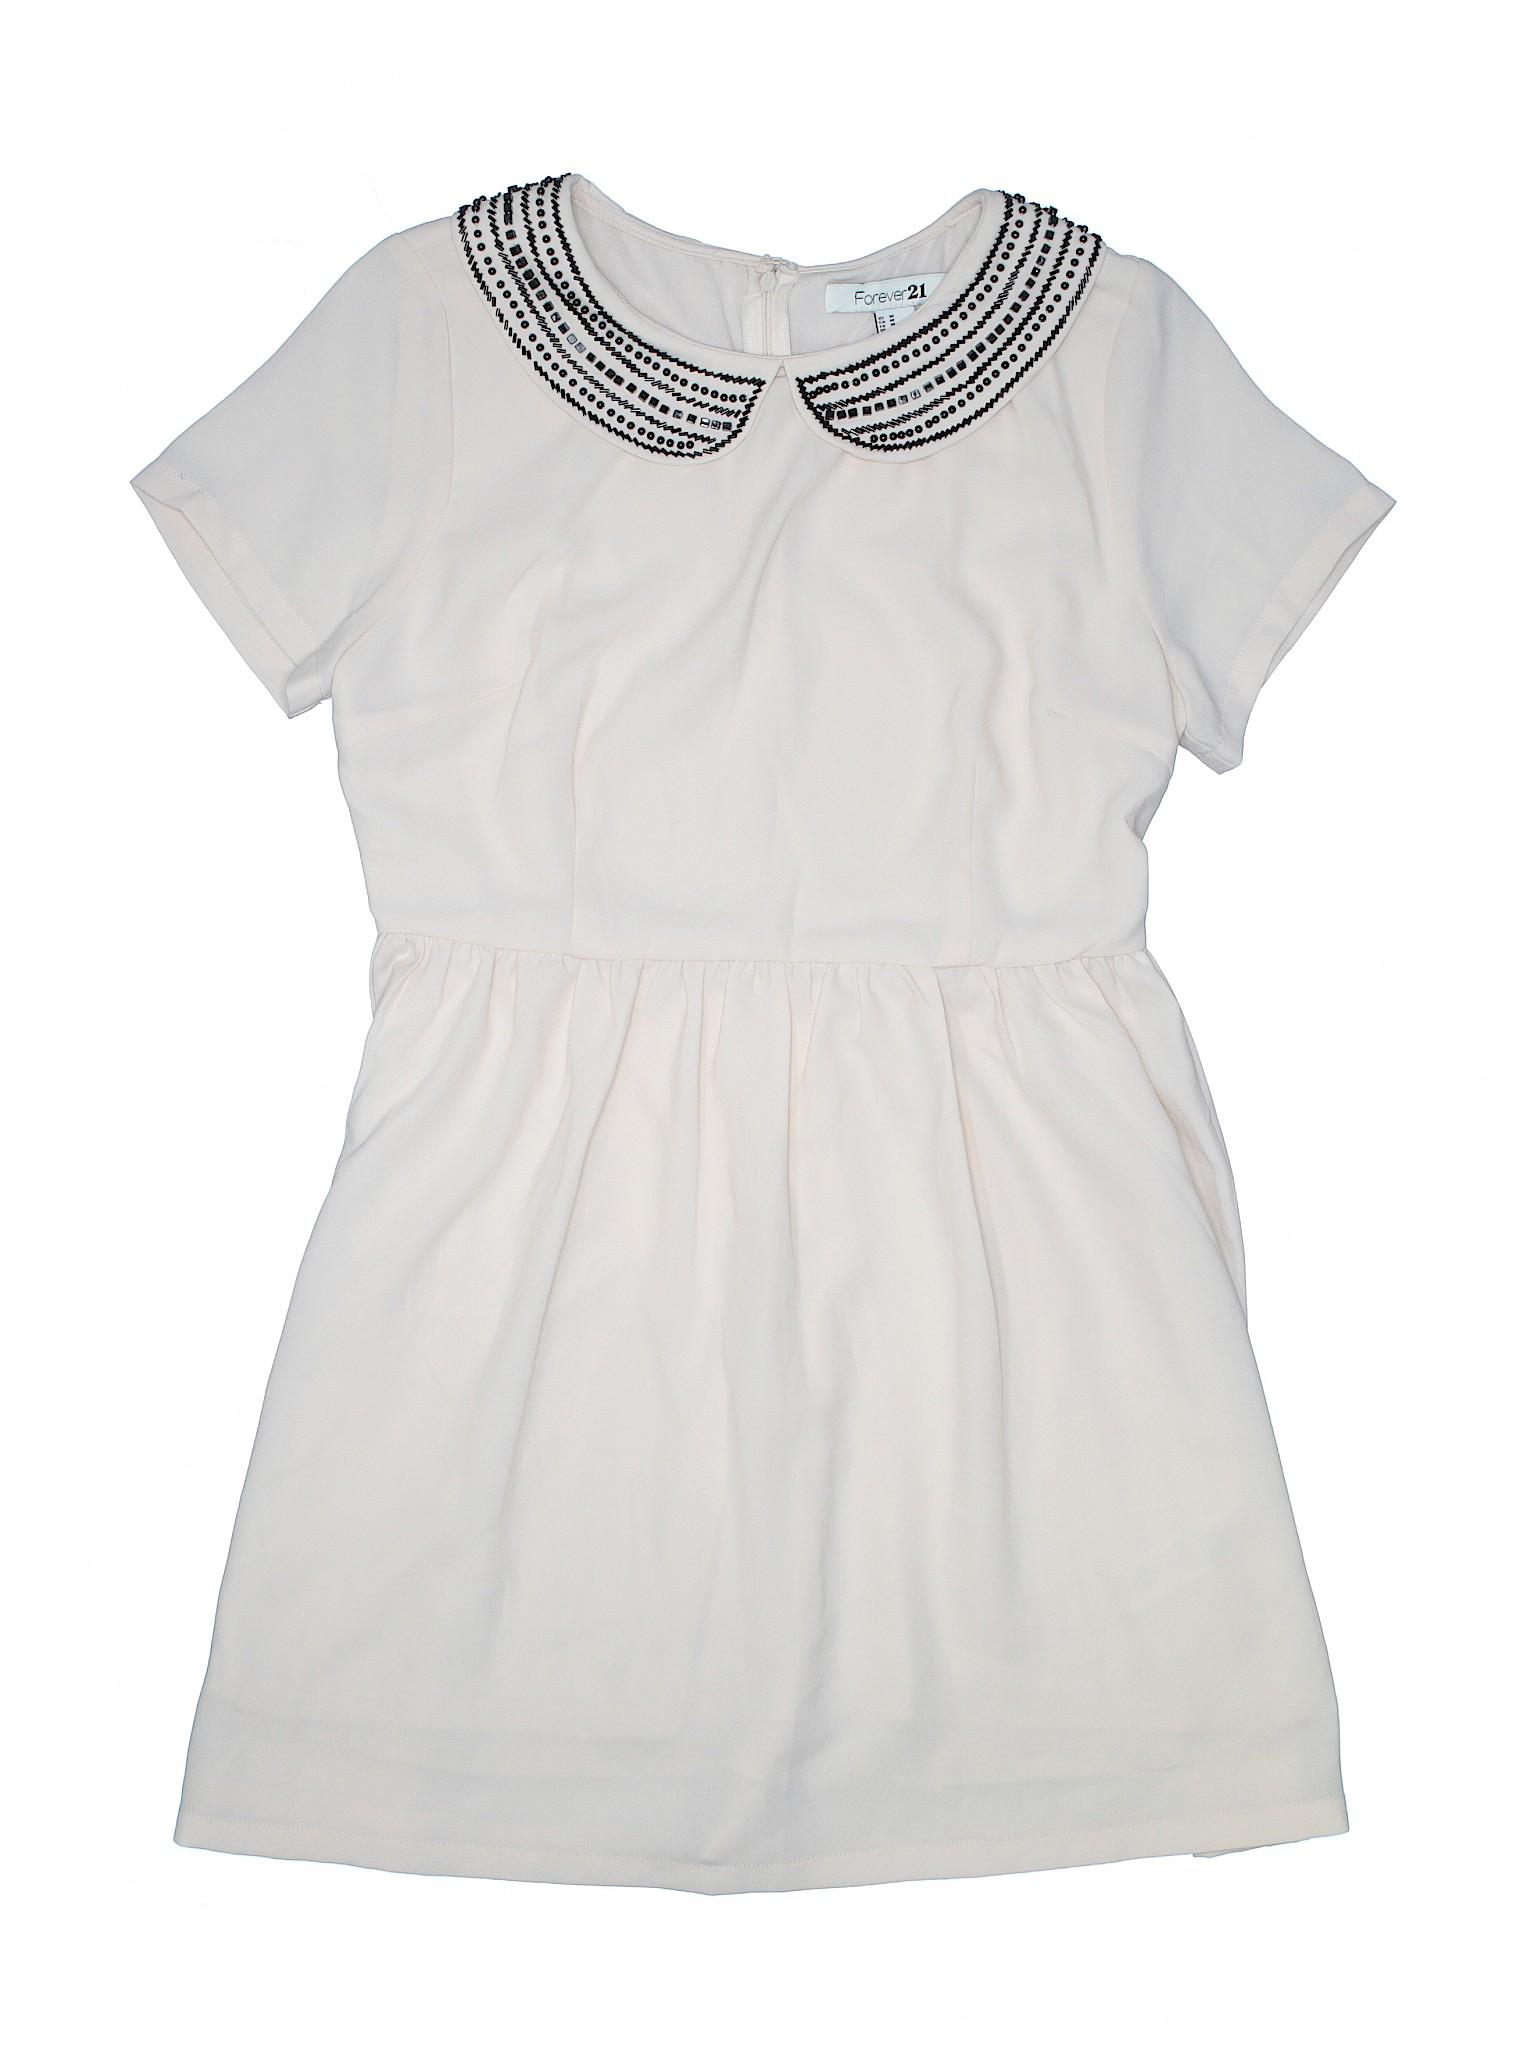 winter Dress Casual Forever 21 Boutique qnxdz7qwHU